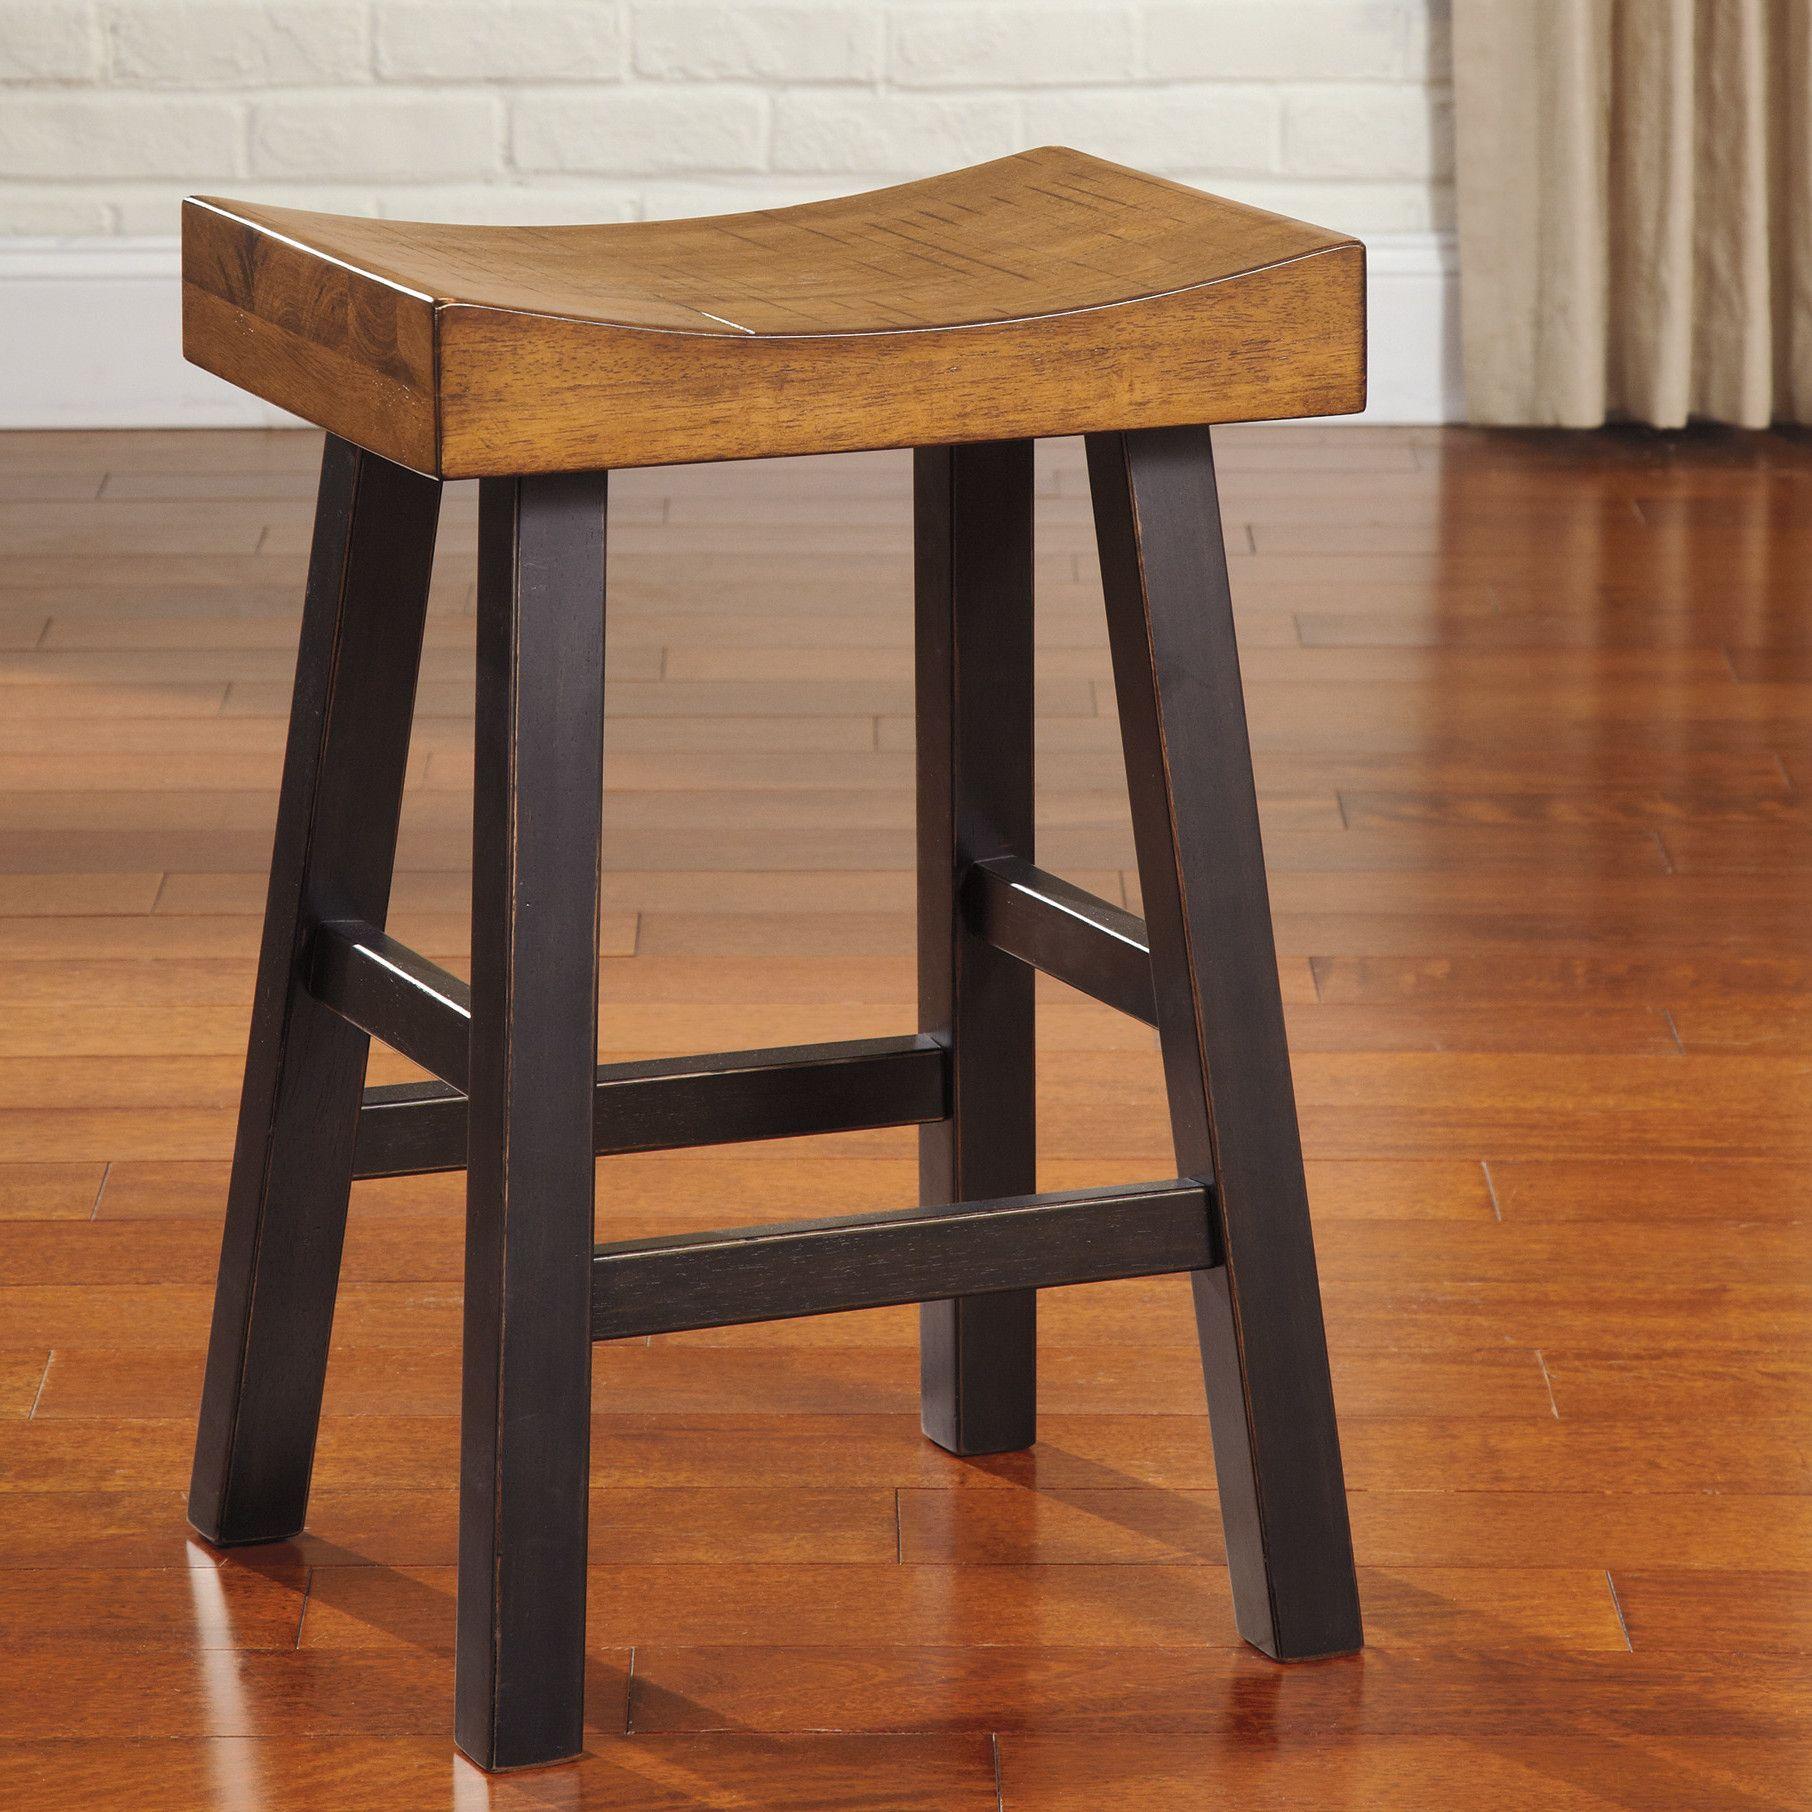 Signature Design By Ashley Glosco 25 Bar Stool Set Of 2 Counter Stools Backless Bar Stools Backless Bar Stools